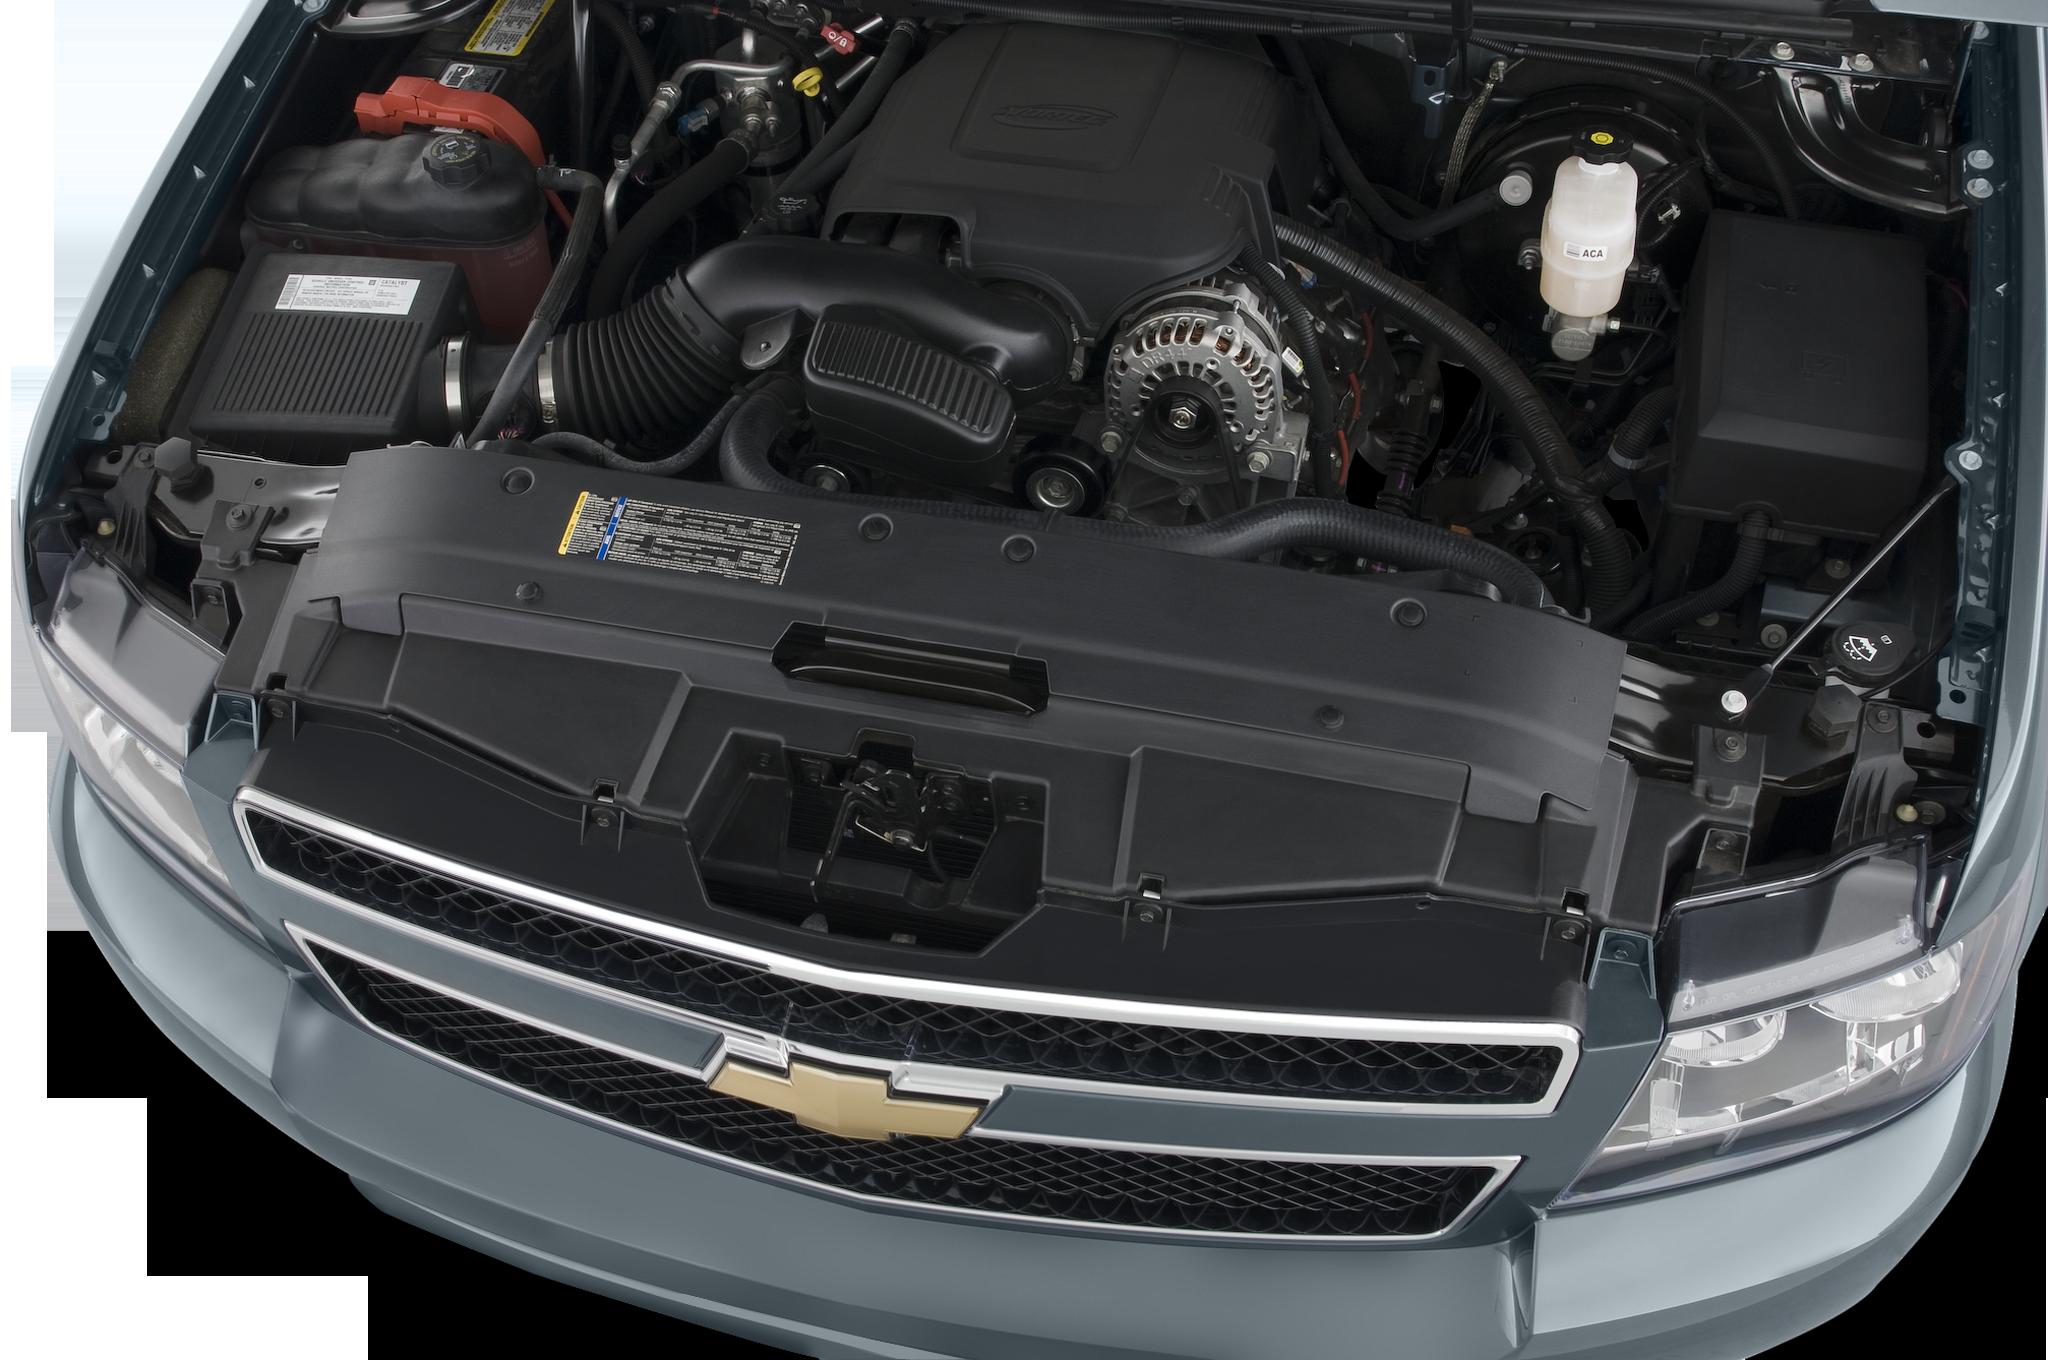 2015 GMC Yukon Chevrolet Tahoe Spotted Testing